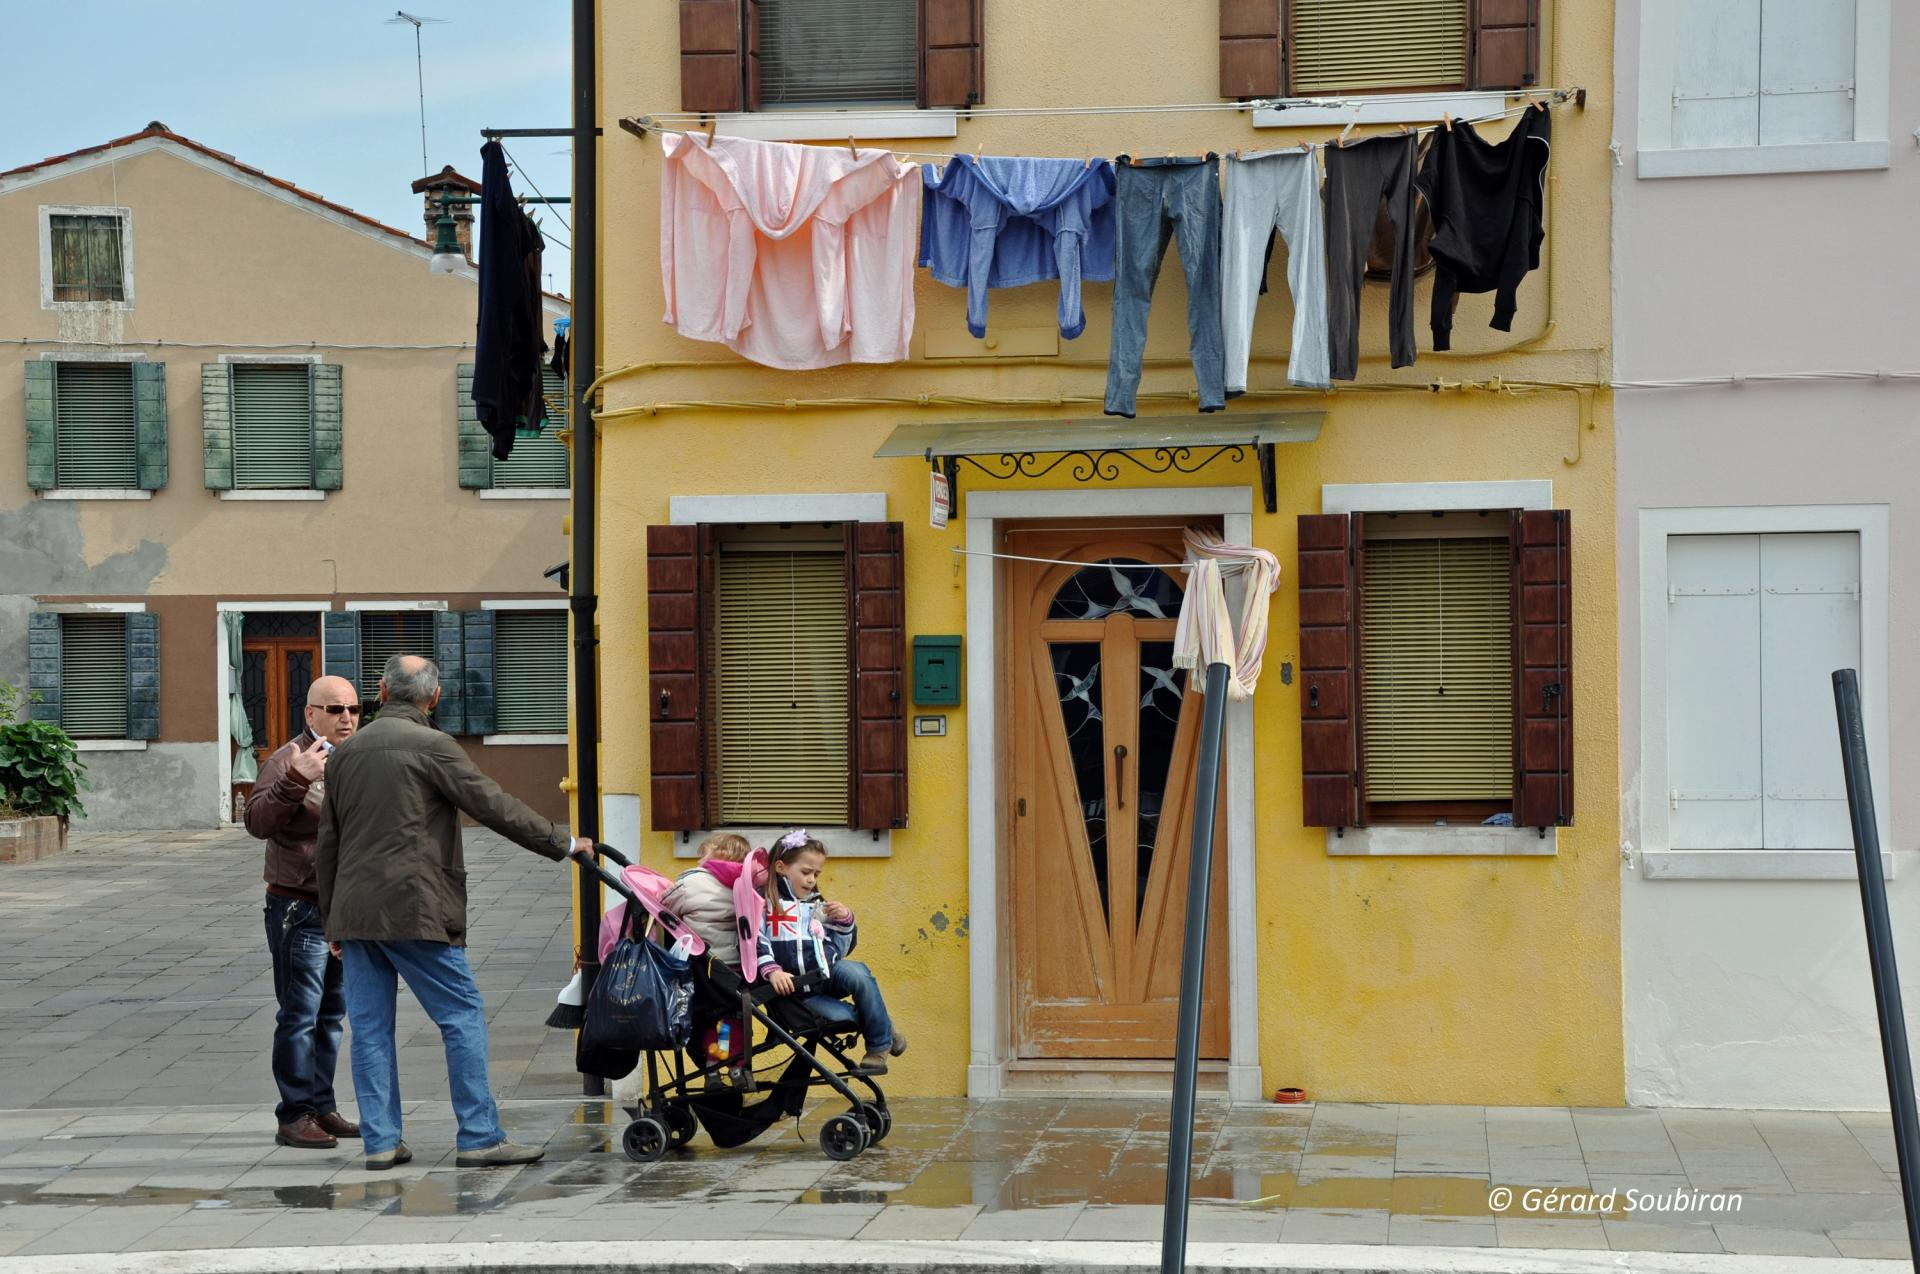 La rue, de Gérard Soubiran